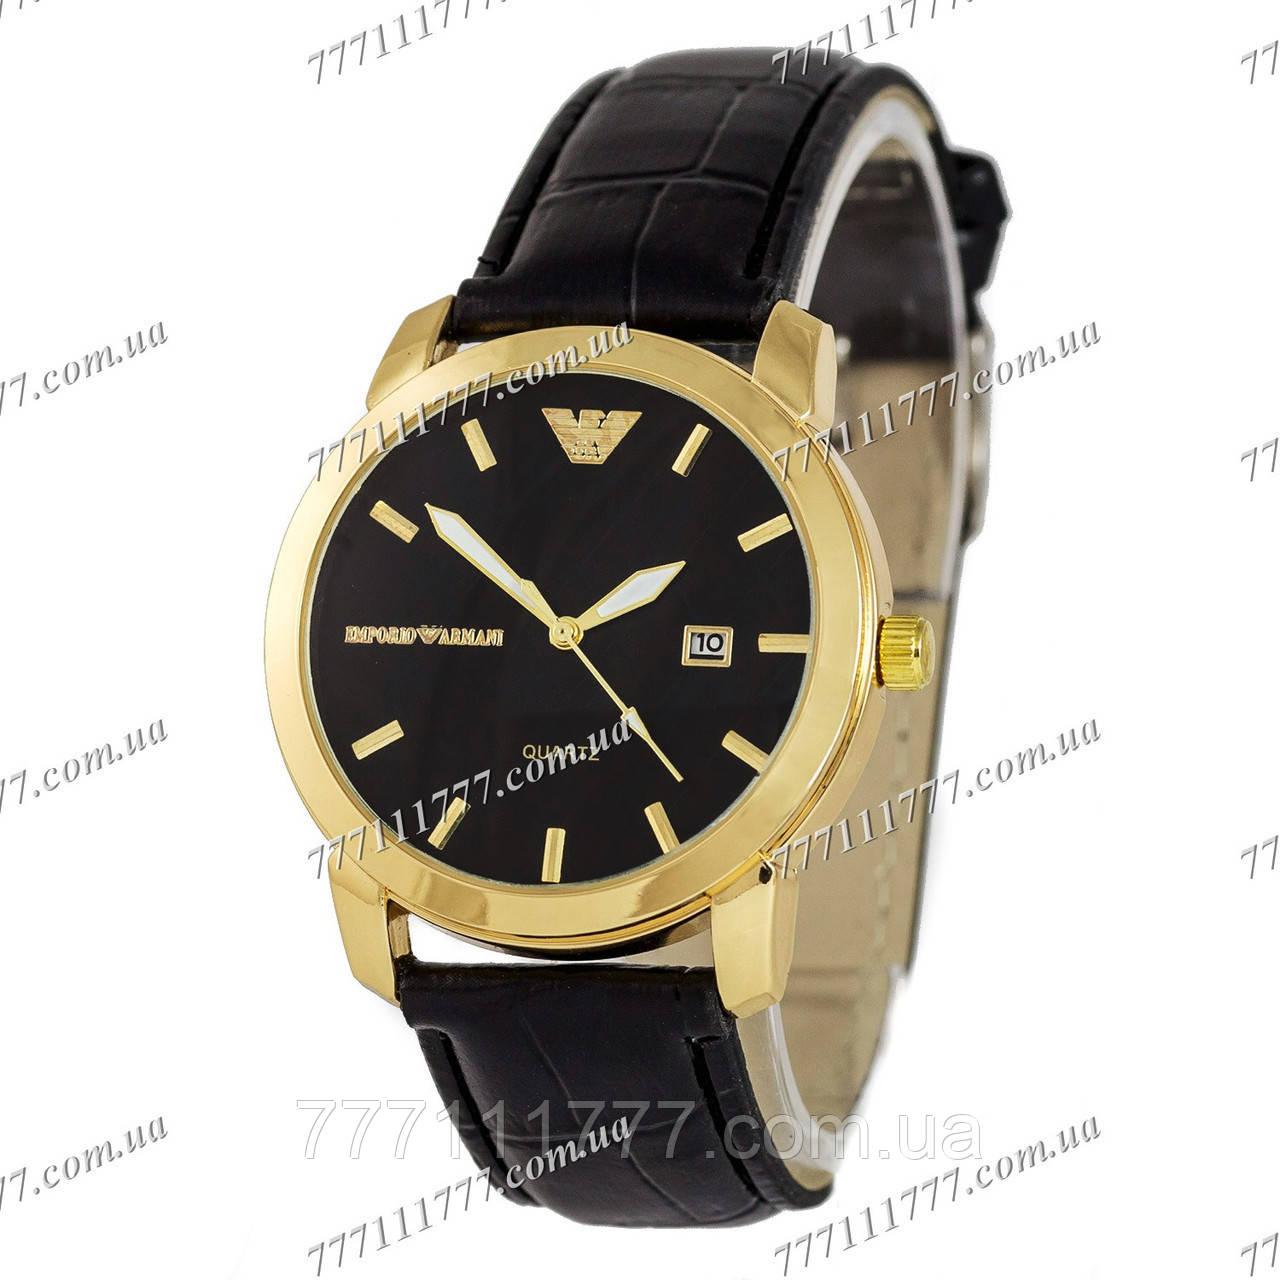 1295ad02 Часы мужские наручные Armani Quartz B65 Black/Gold/Black: продажа ...